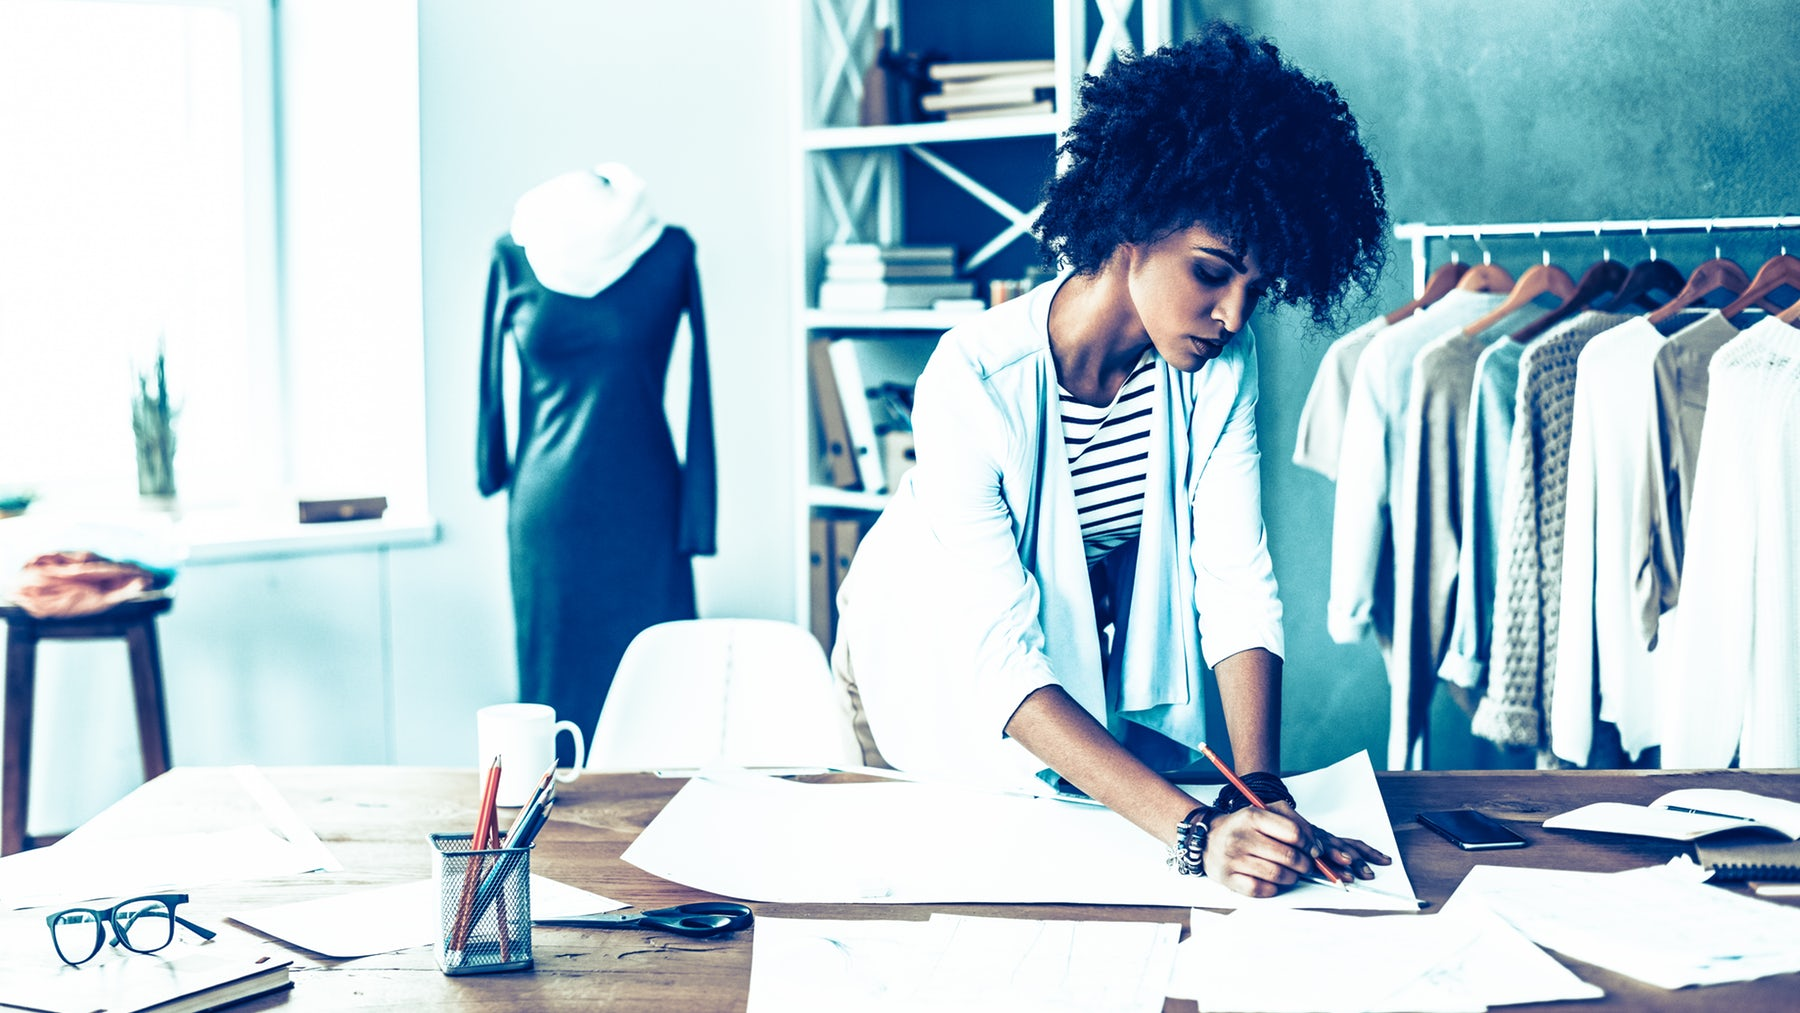 Fashion Graduate Jobs - May 2018 19